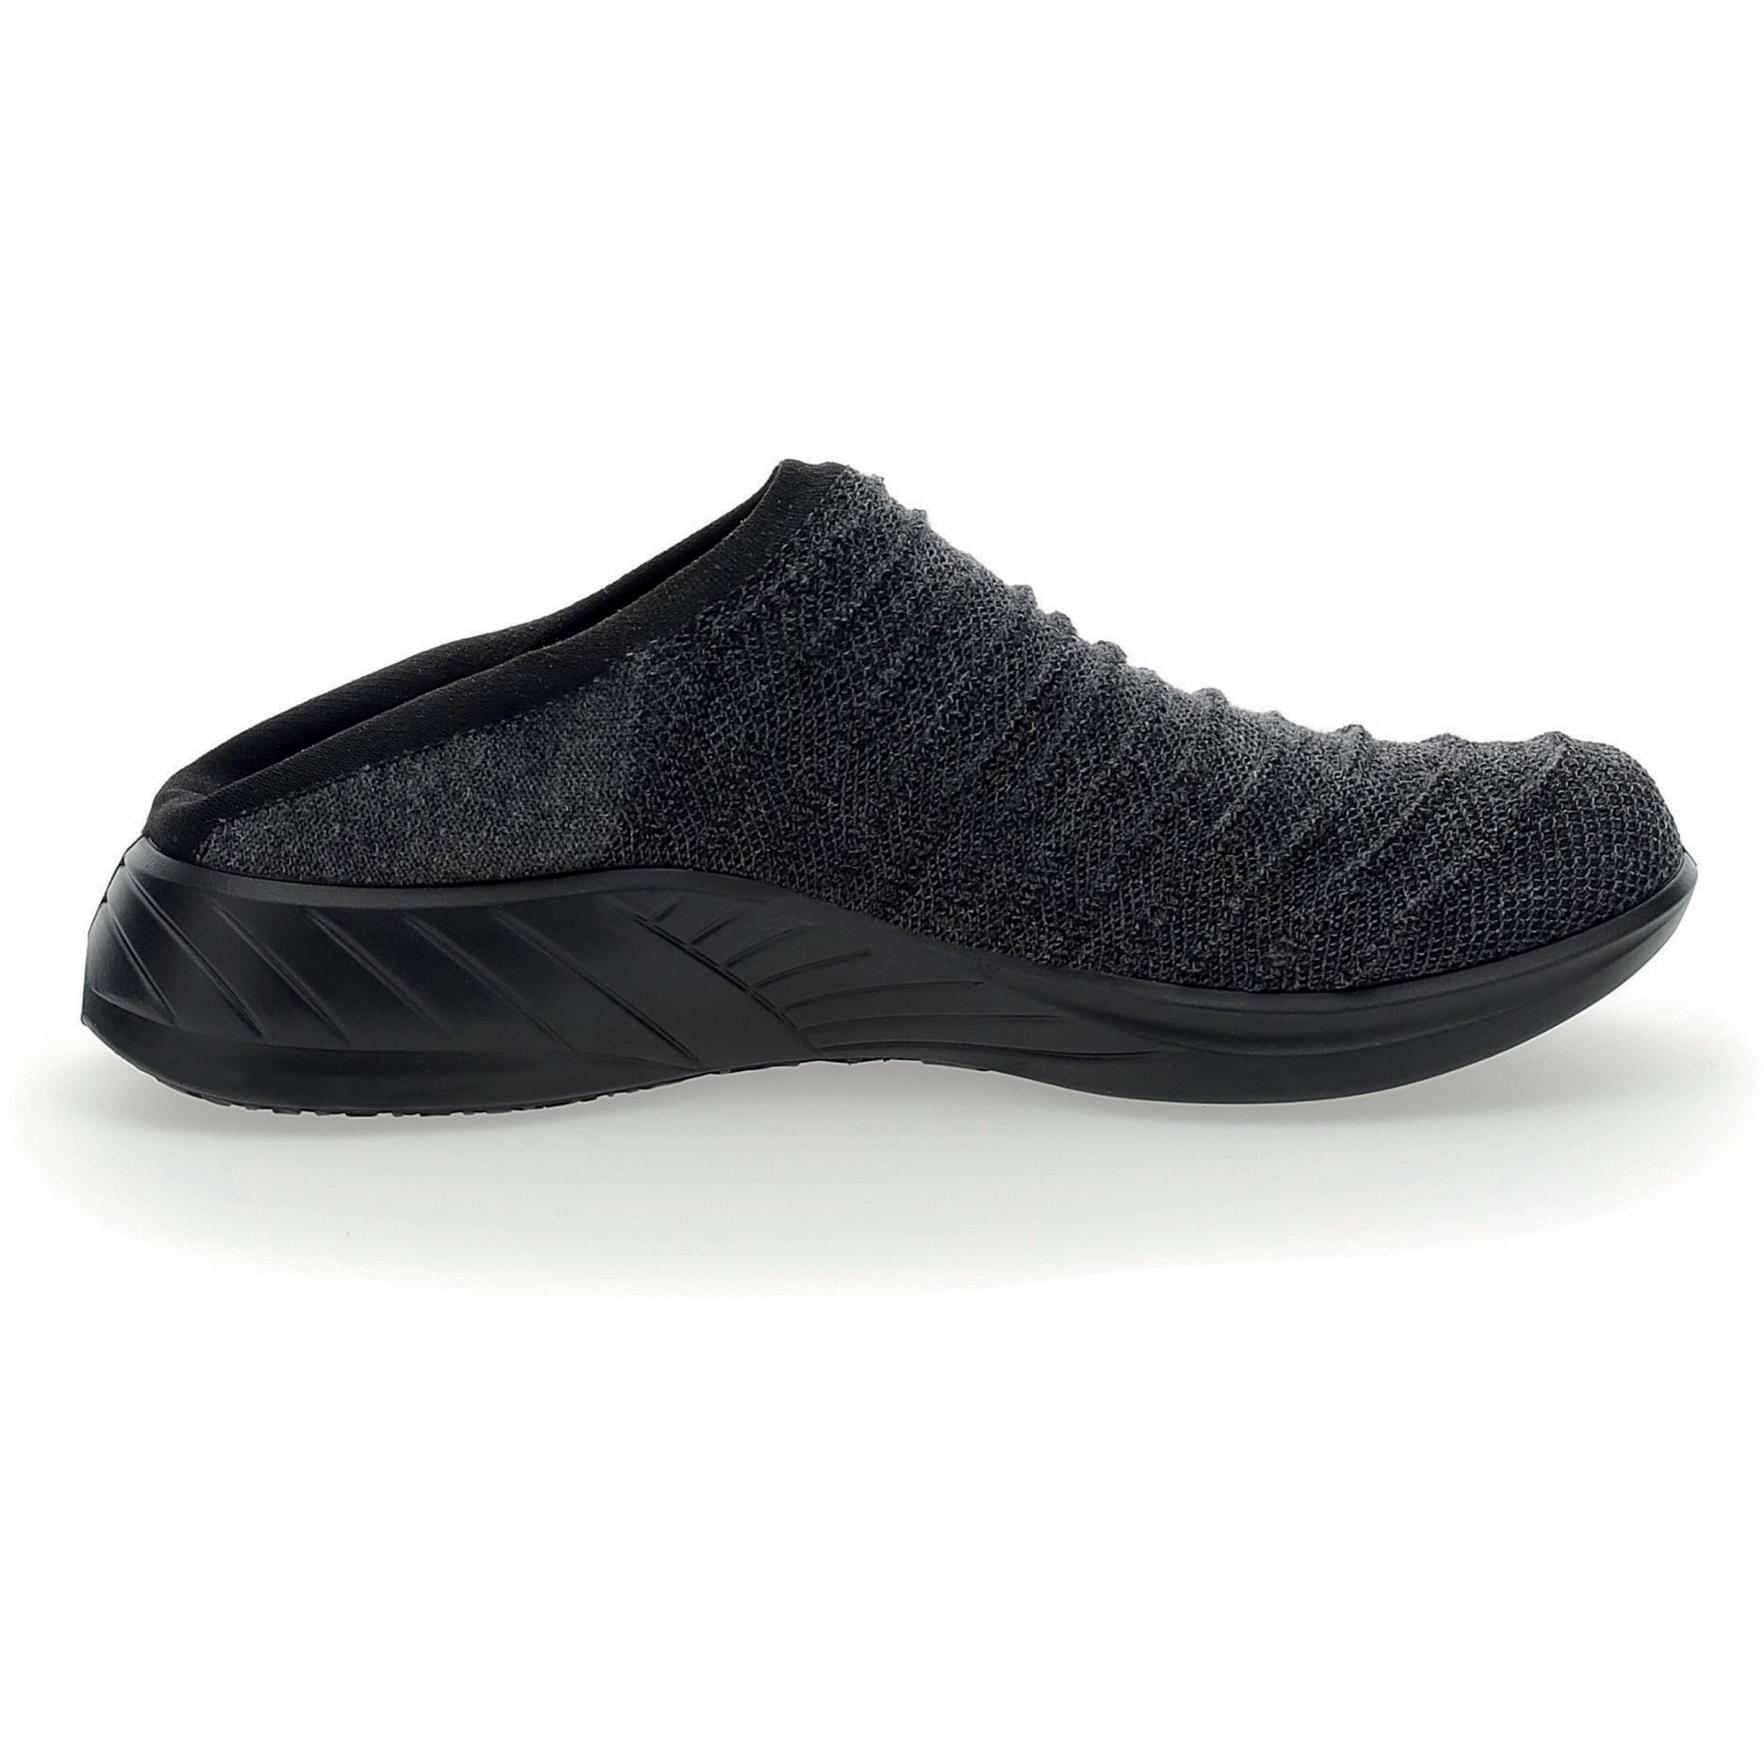 Image of UYN Sabot 3D Ribs Wool Black Sole Slippers - Anthracite Melange/Black